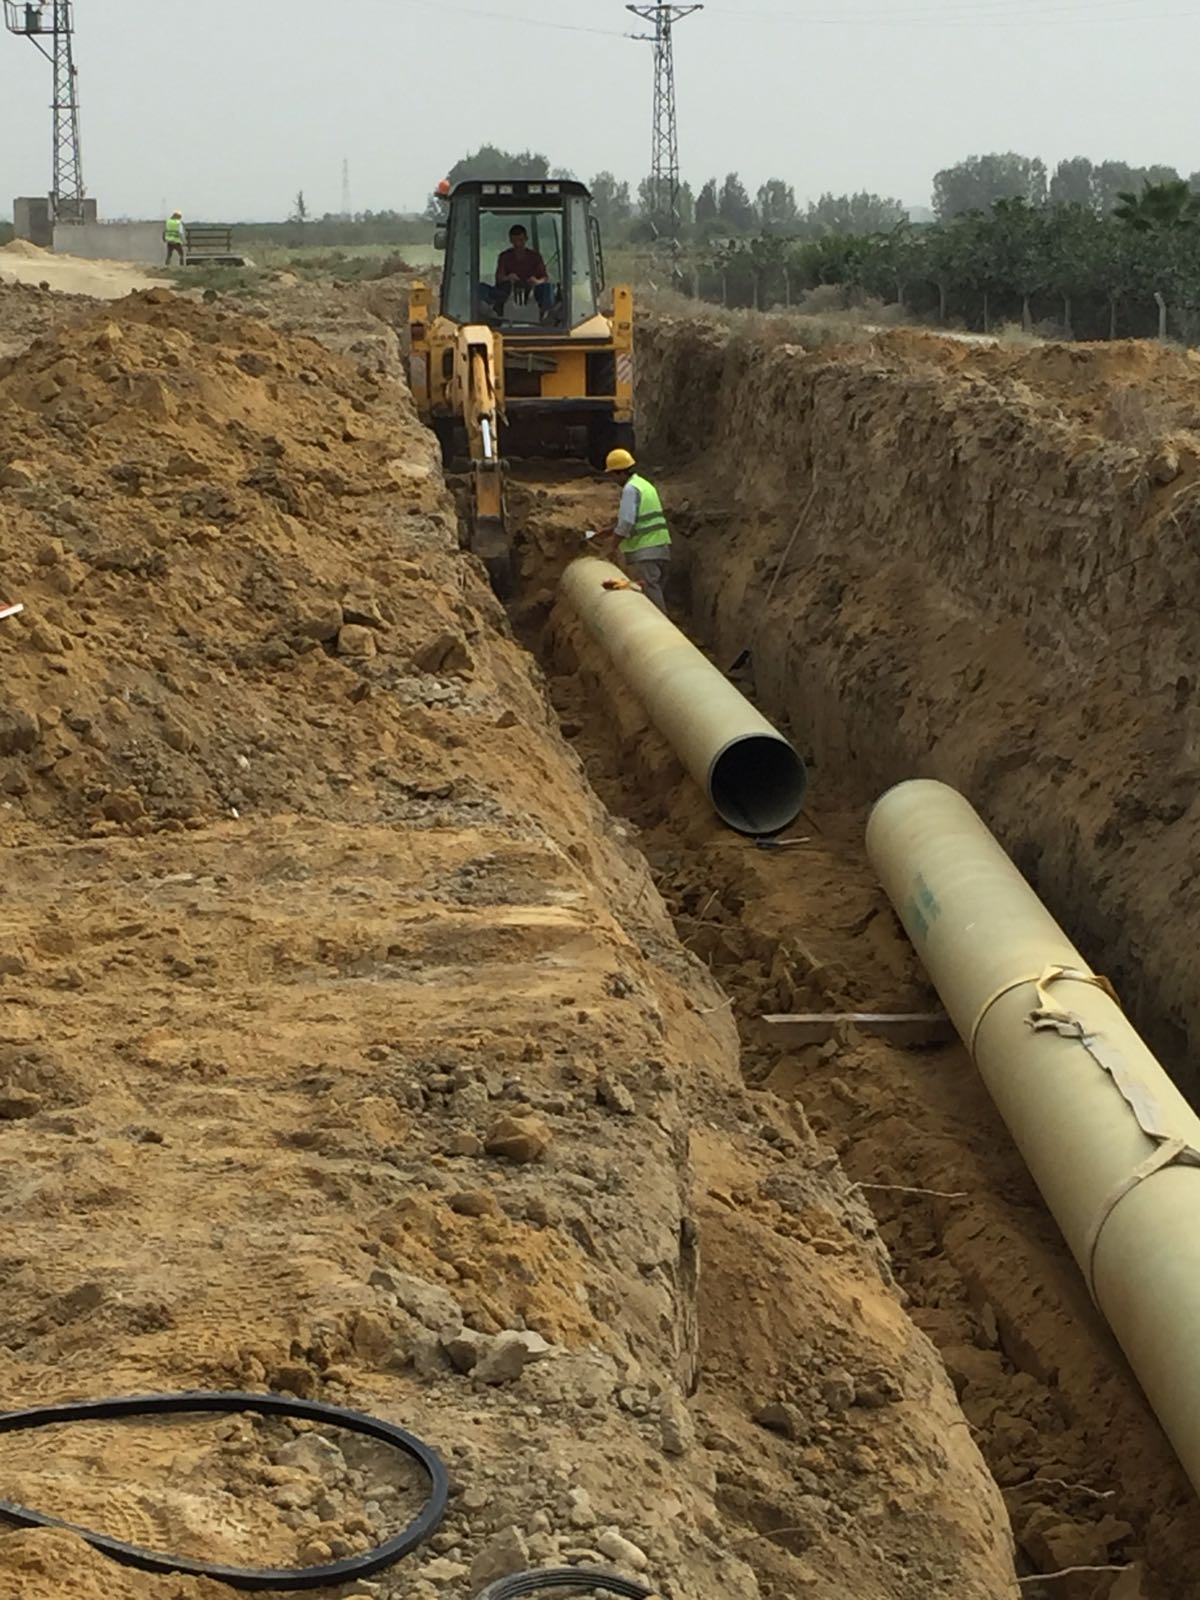 Salt Water Transmission Line Construction Work - BARANKAYA